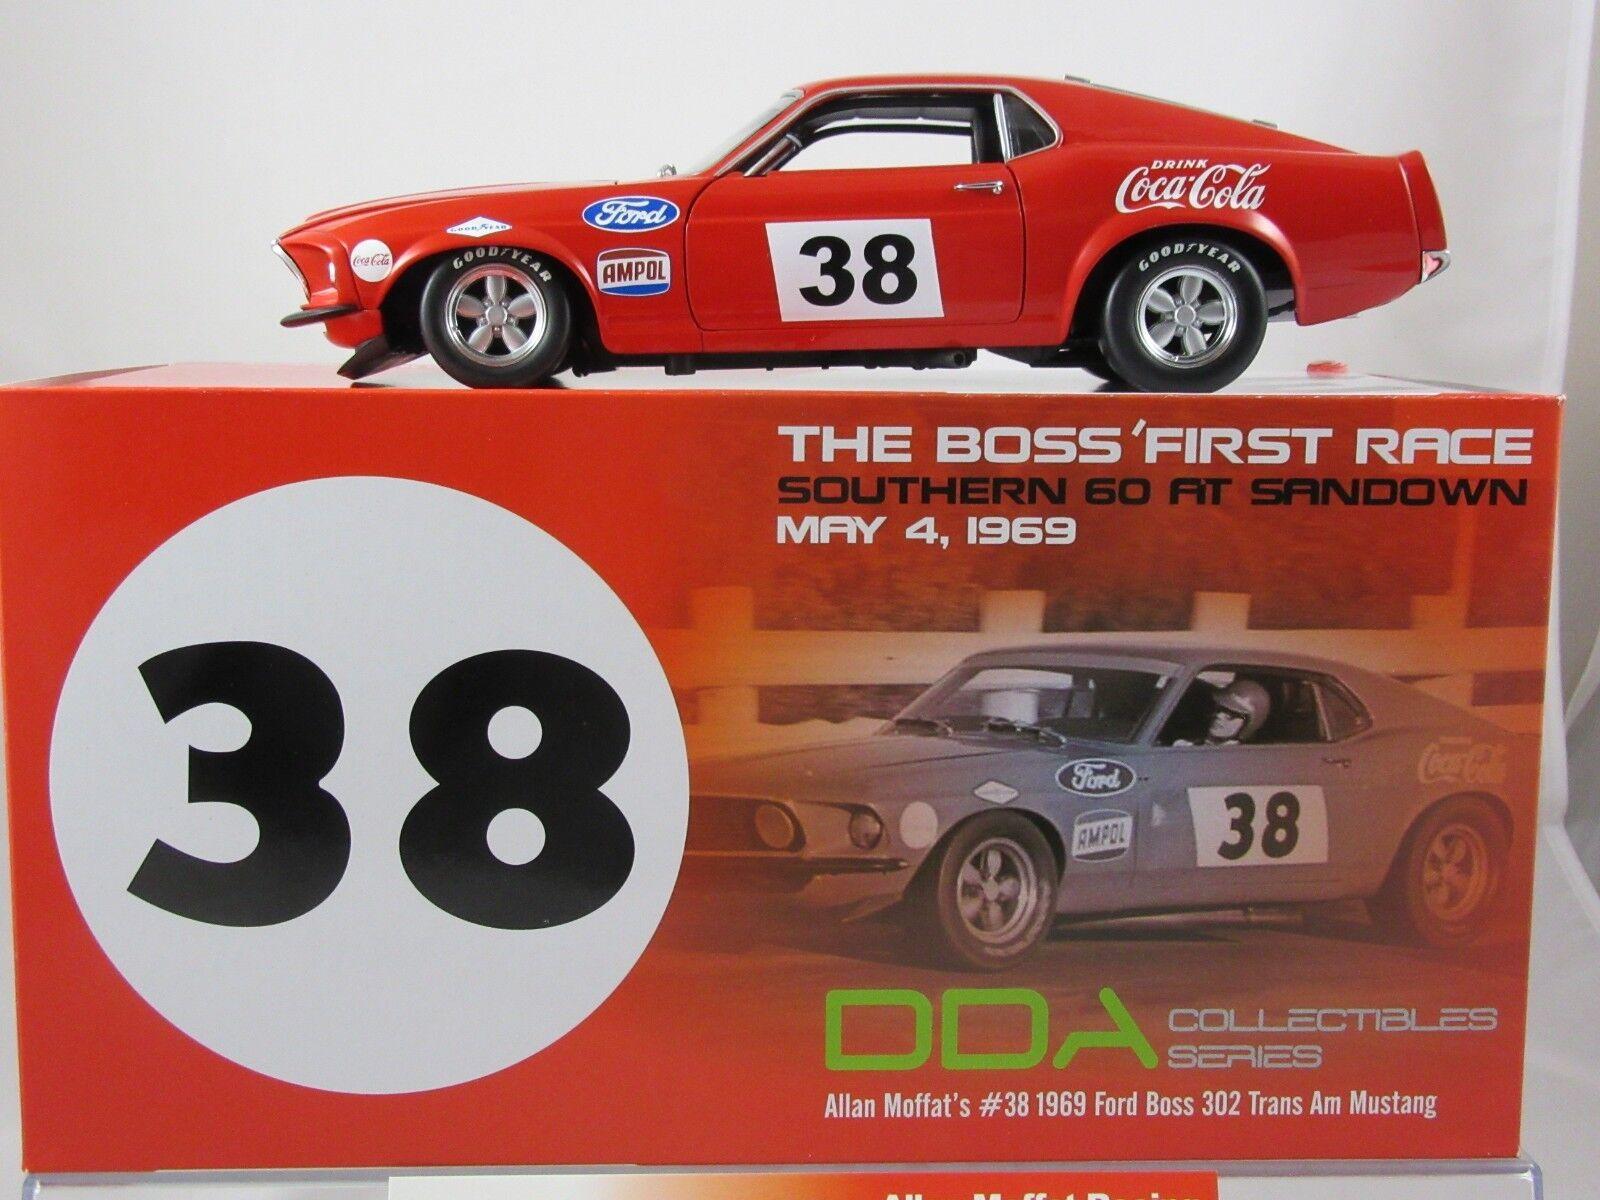 Acme 1969 ford boss 302 trans am, mustang   38 allan moffat - dda exklusive a18018